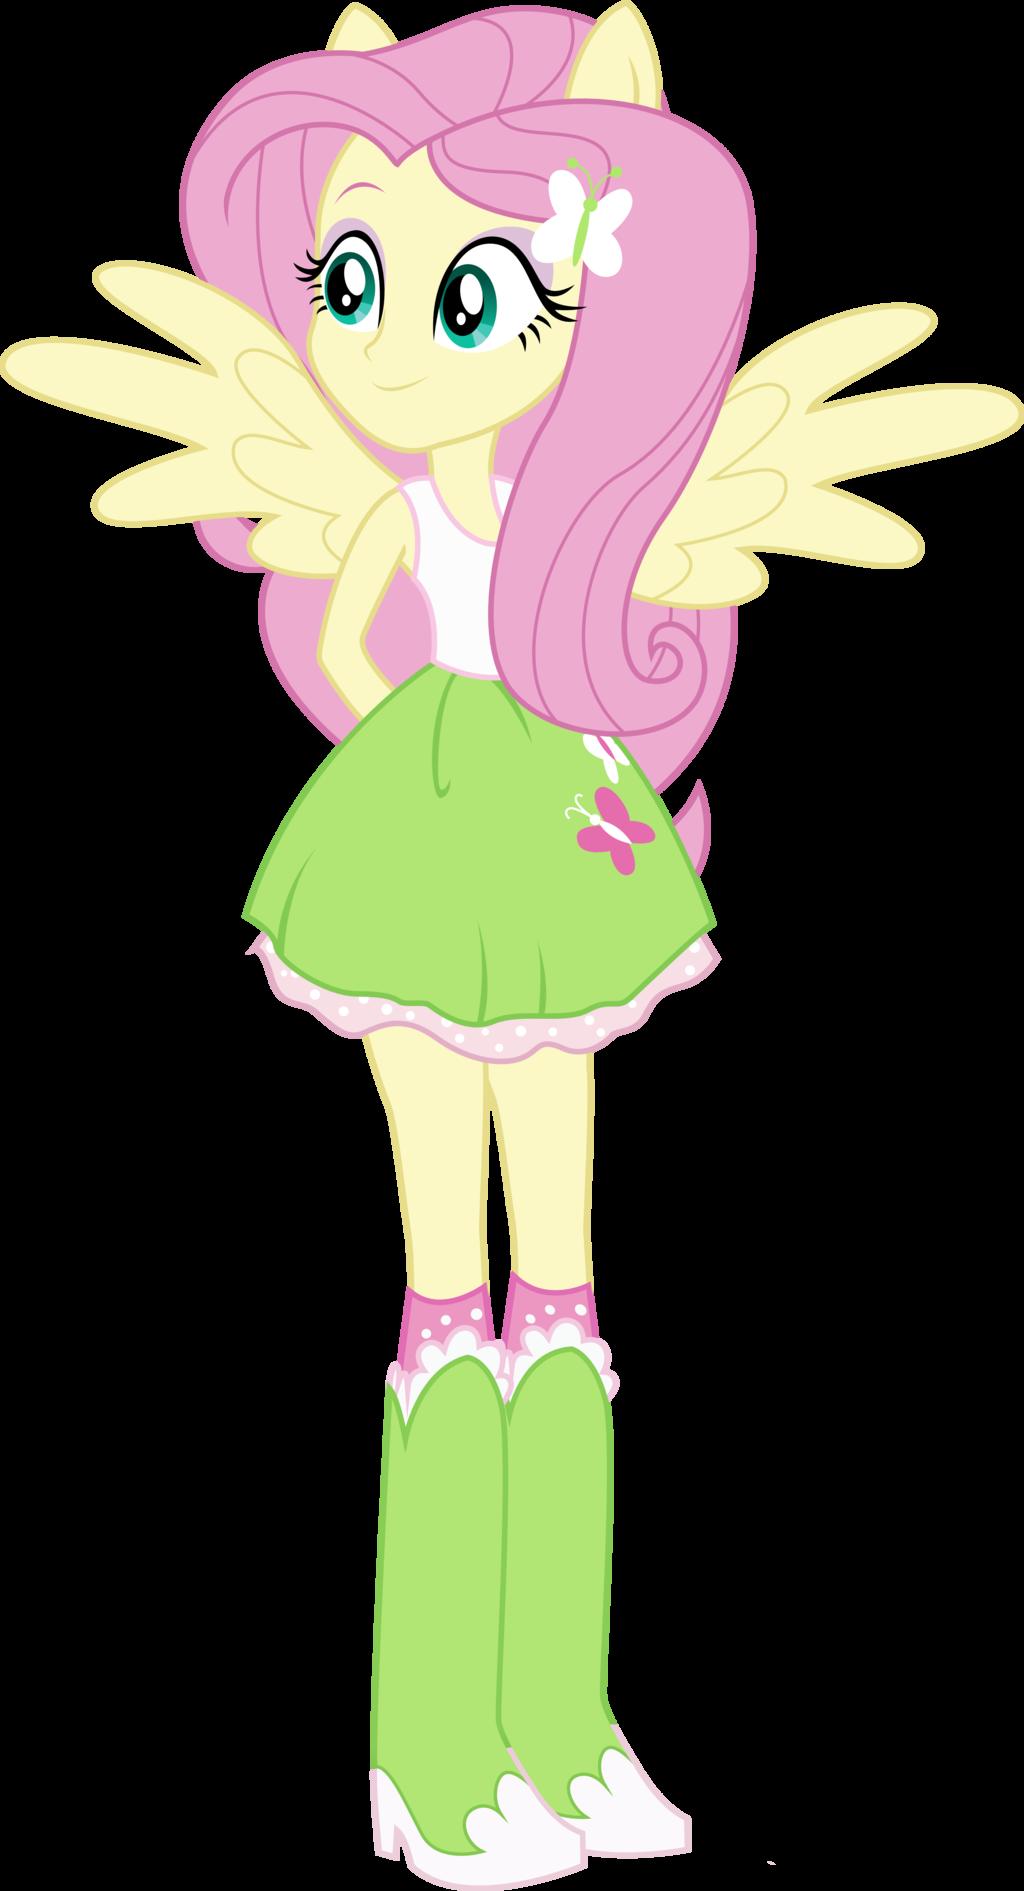 Equestria Girls Fluttershy by TheShadowStone on